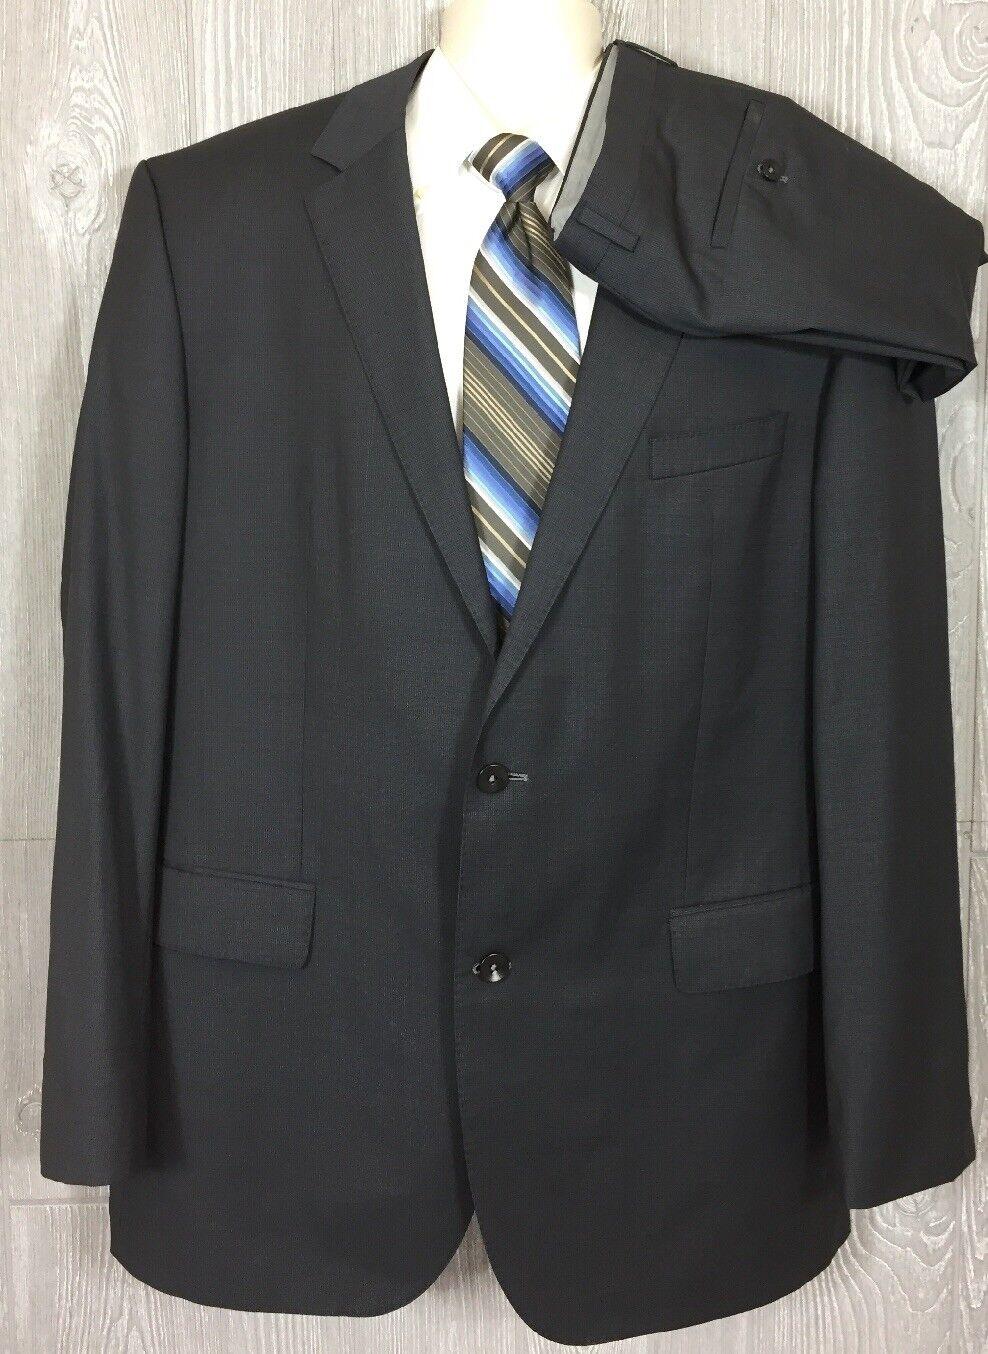 10f346379 Recent Hugo Boss Super 100s Slim Fit Grey Mens 2pc Suit 46 Long 38x33 (t12